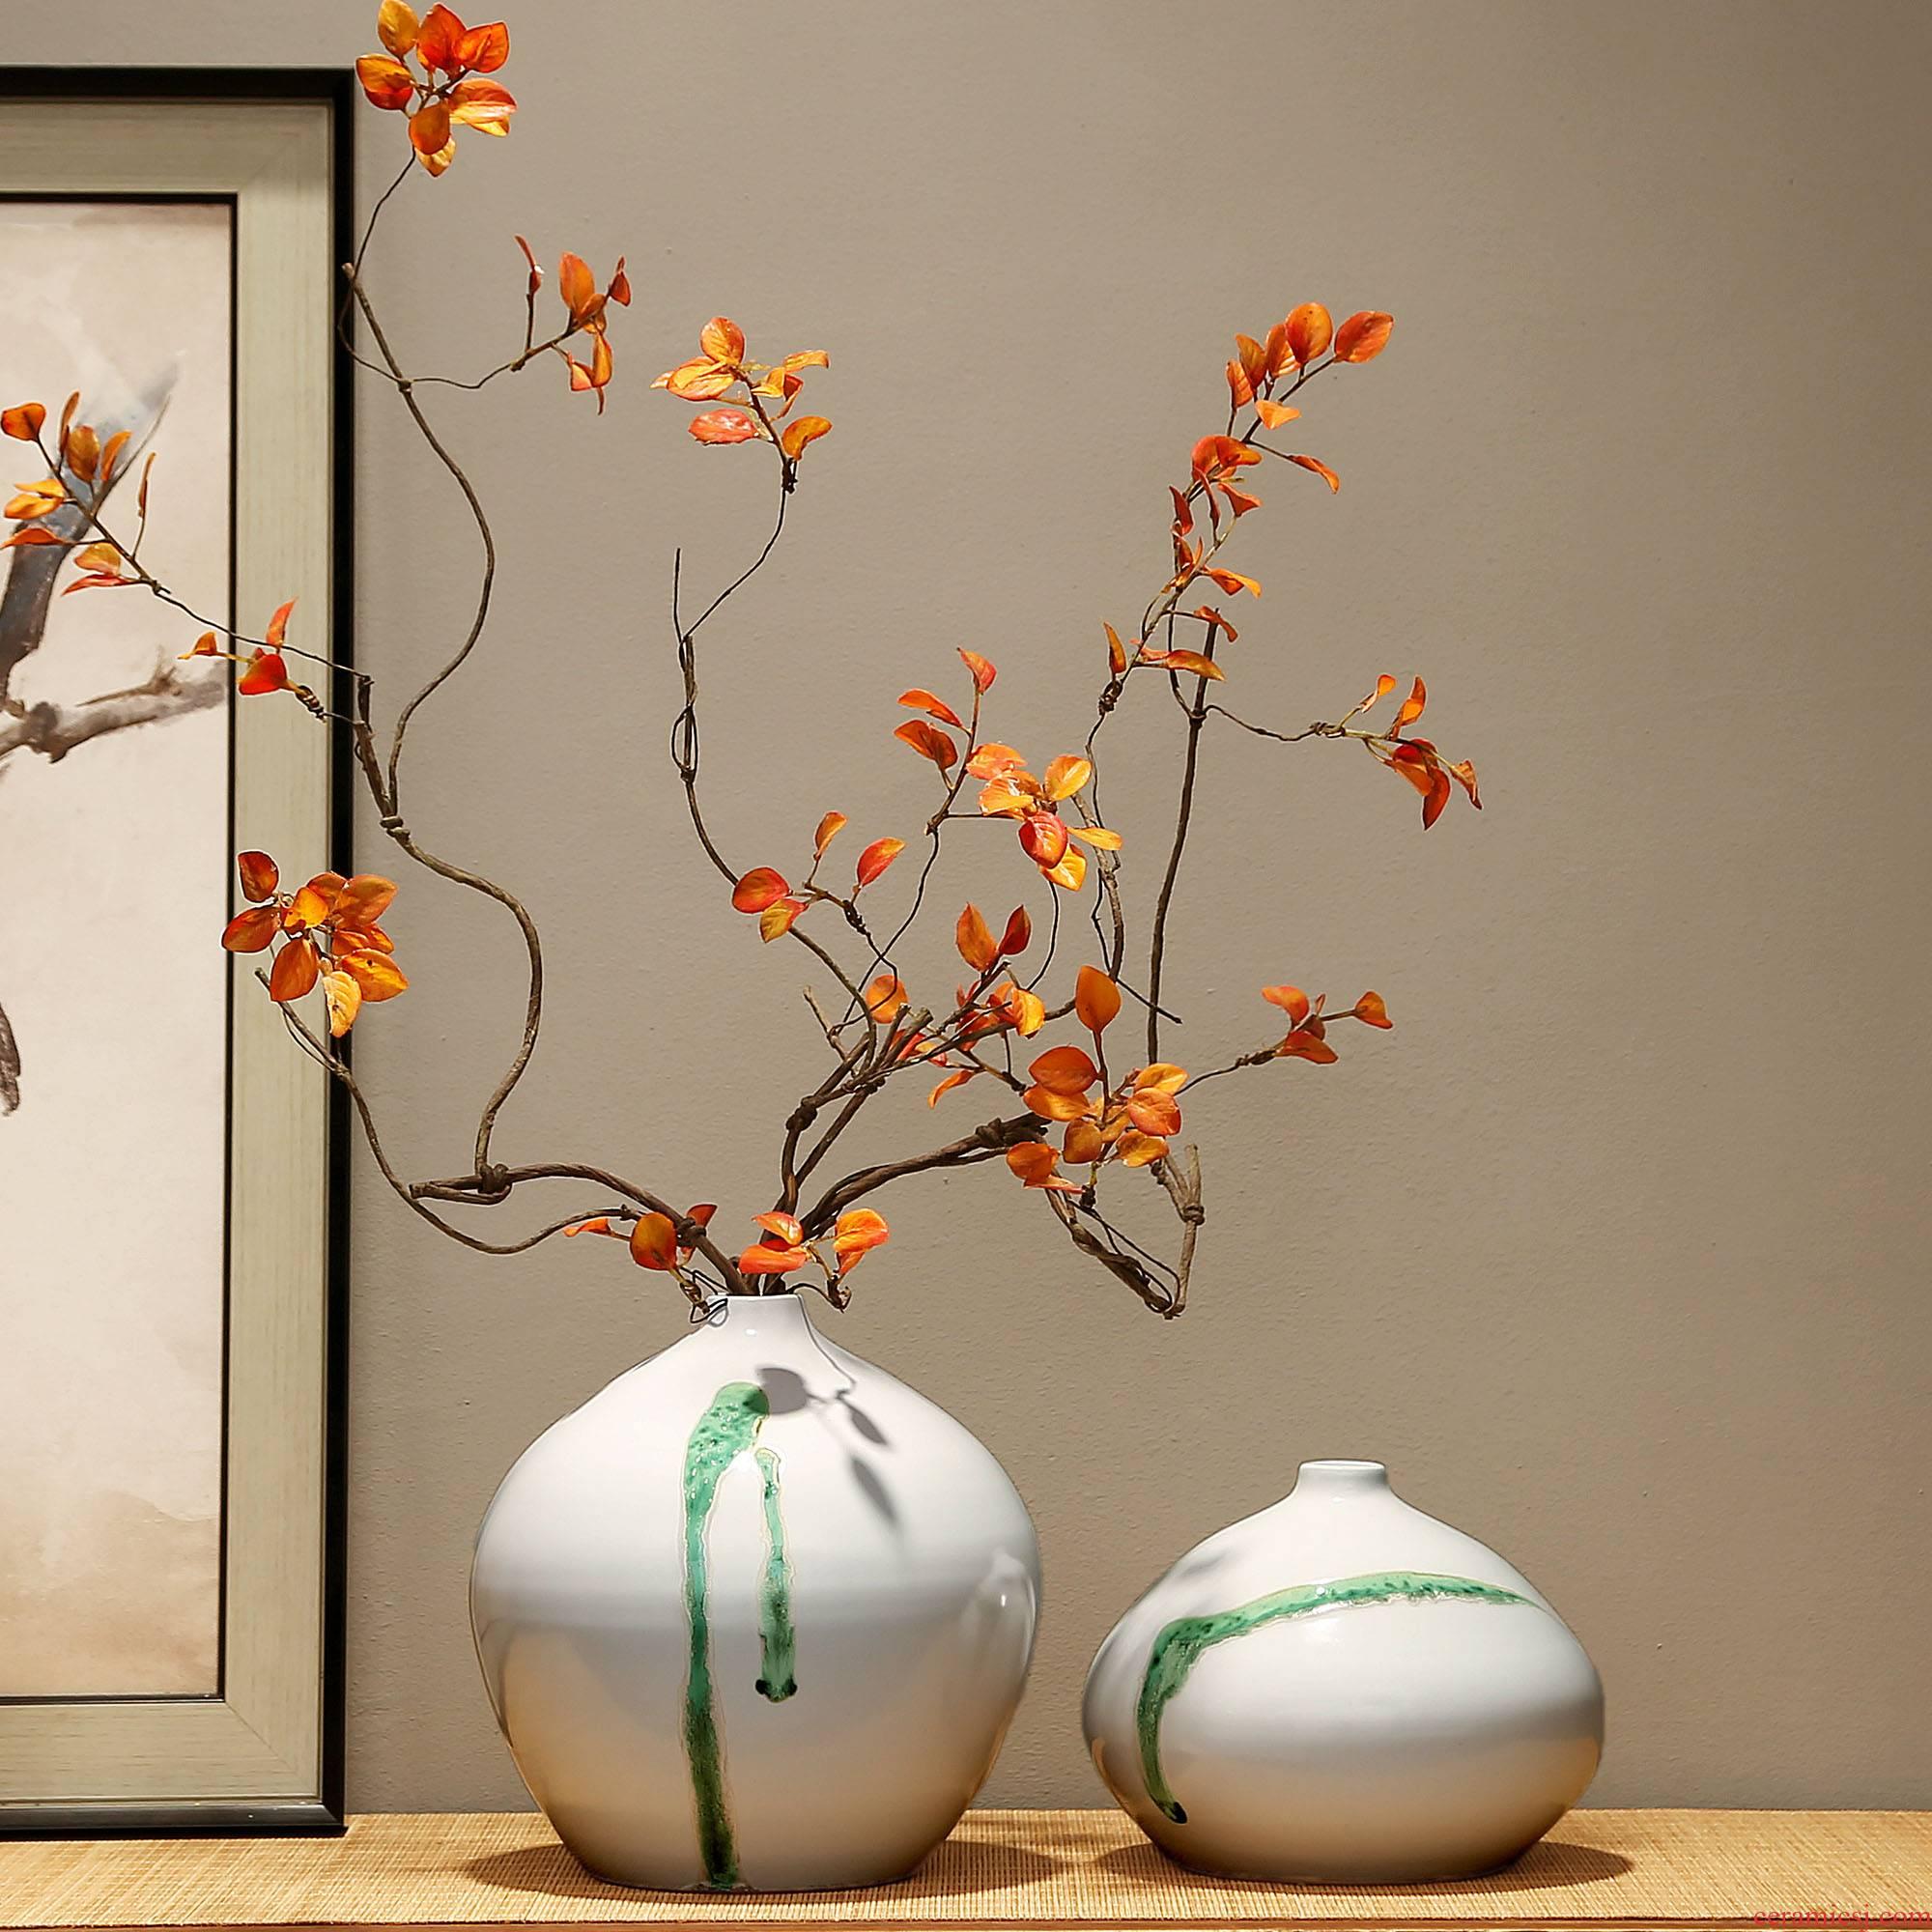 Jingdezhen new Chinese zen decorations dried flower vase furnishing articles porch combination living room TV cabinet ceramic vase